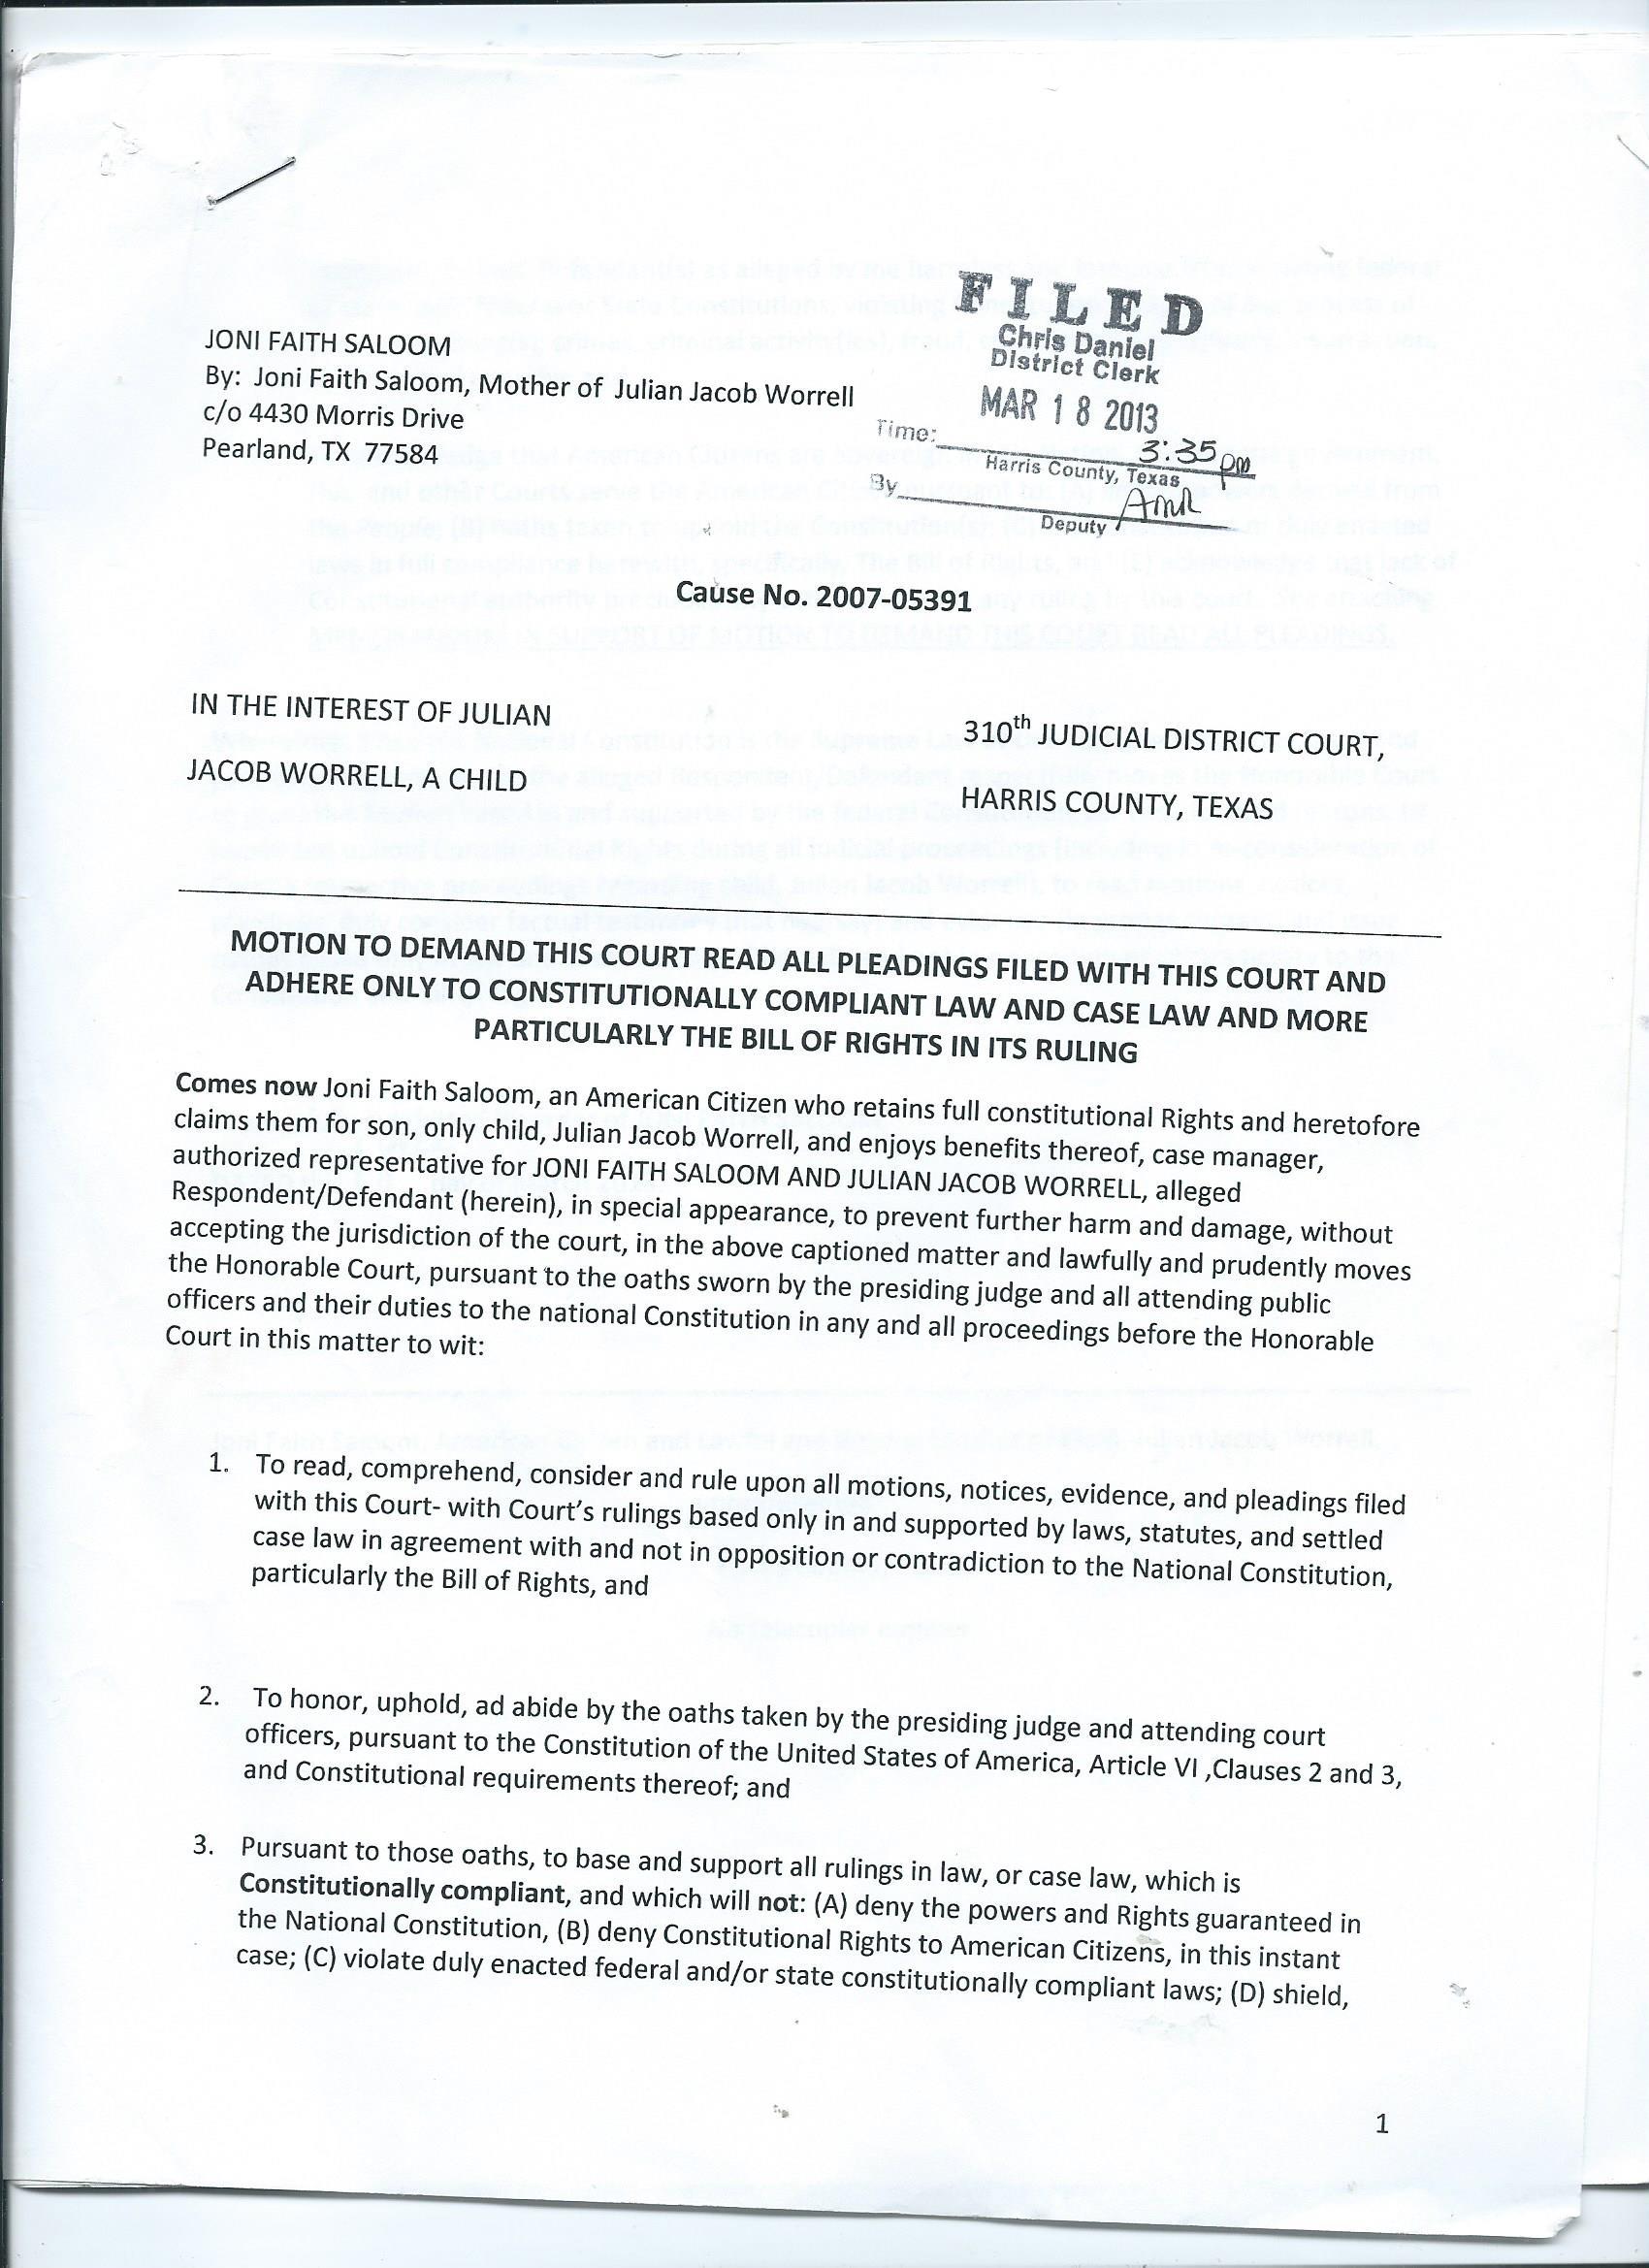 application for amendment of pleadings